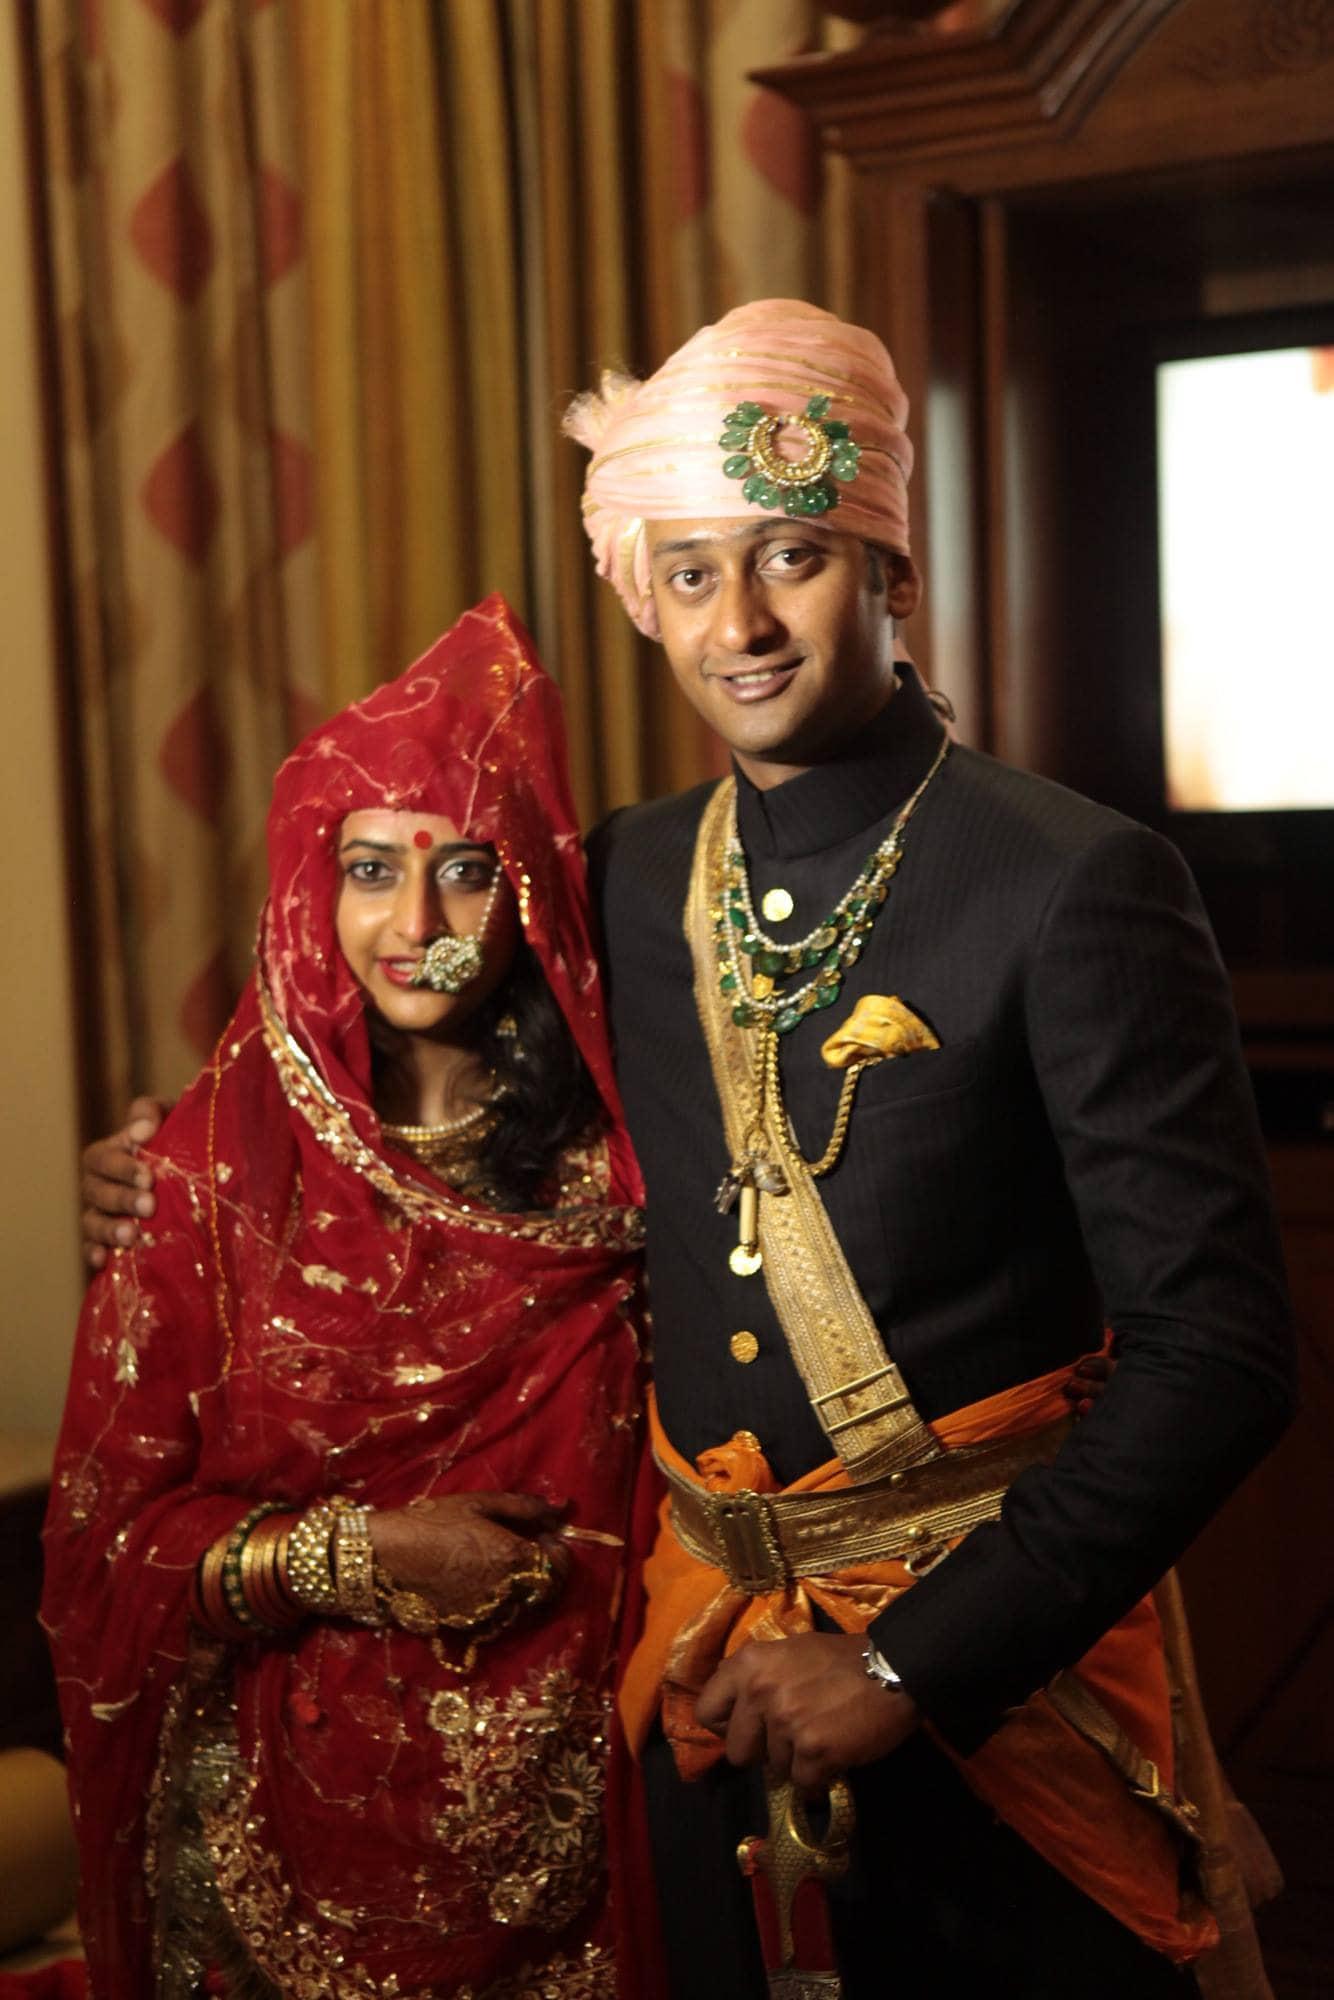 Padmini with her brother, Pratap Singh Rathore